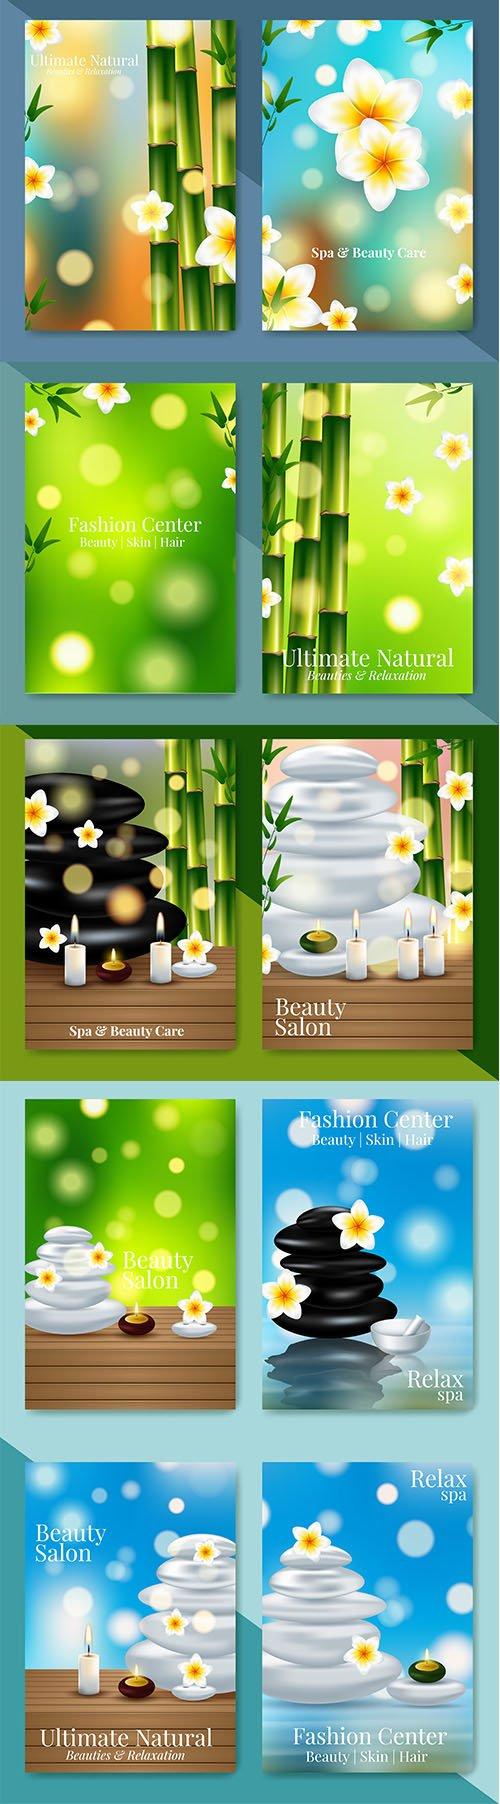 Set of Minimalistic Spa Healthcare Design Illustrations